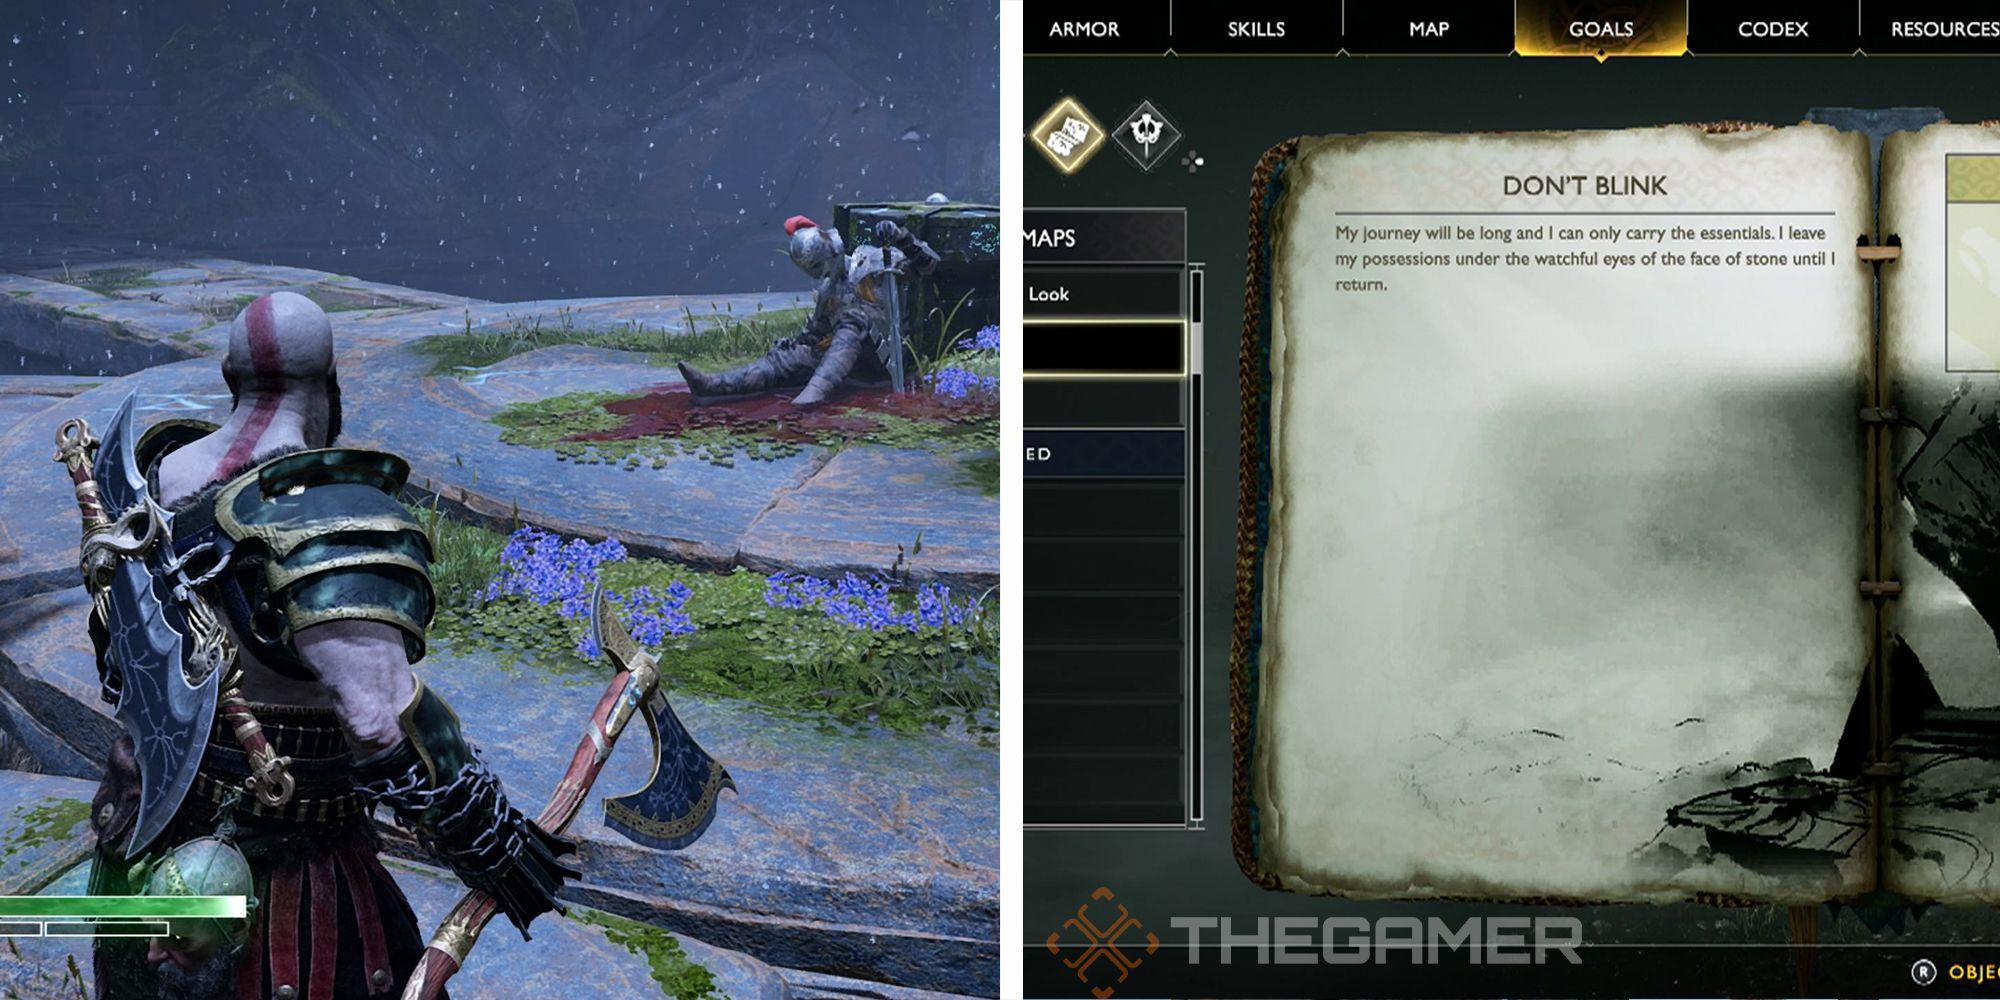 God Of War: Don't Blink Treasure Map Guide